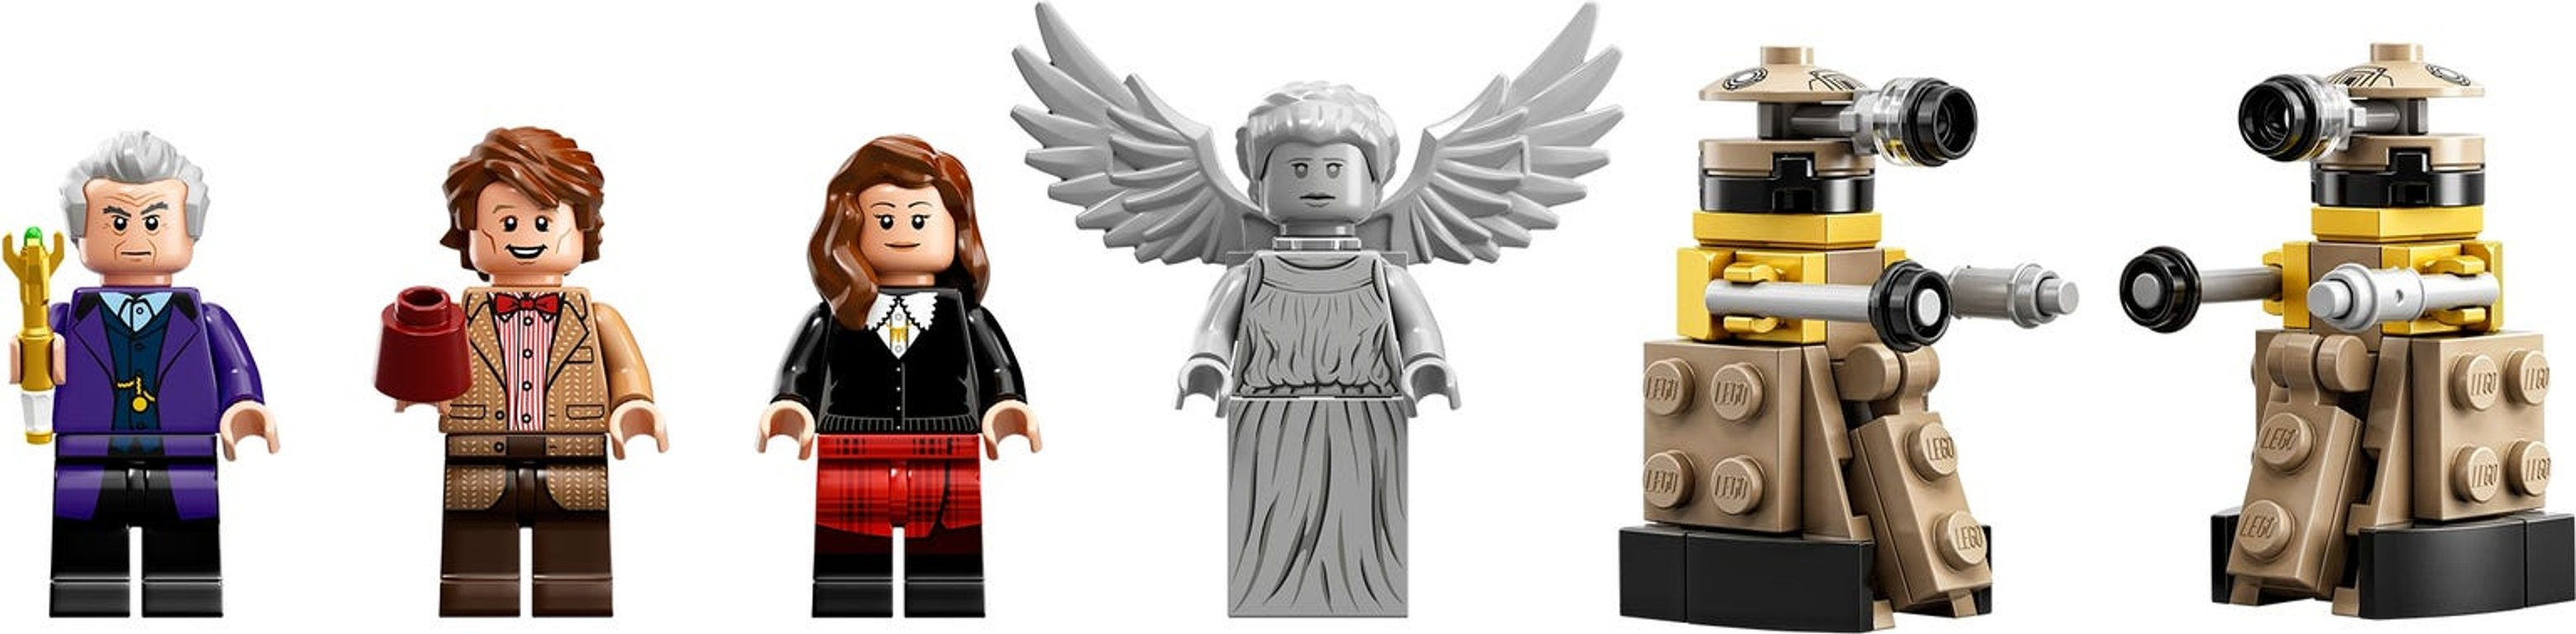 LEGO® Ideas Doctor Who minifigures